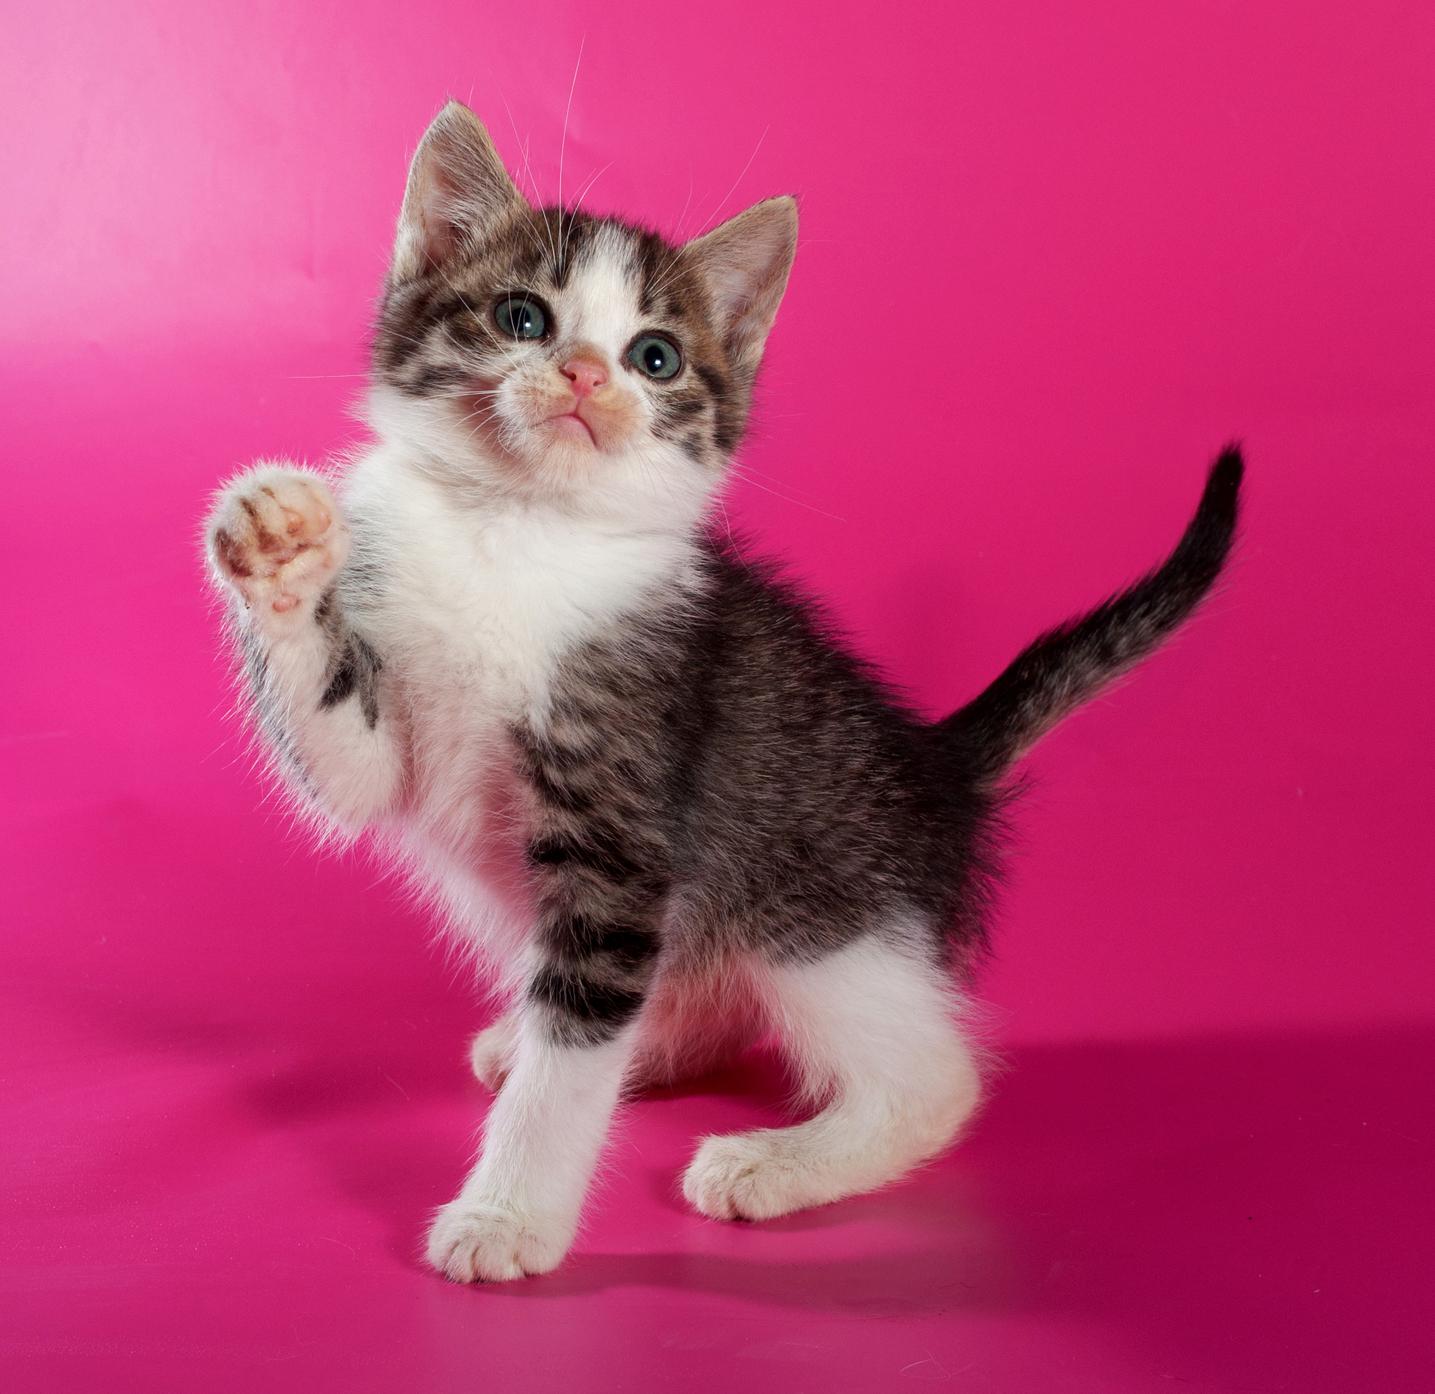 Tierno gatito en fondo color fucsia - Minino | celebrity styles